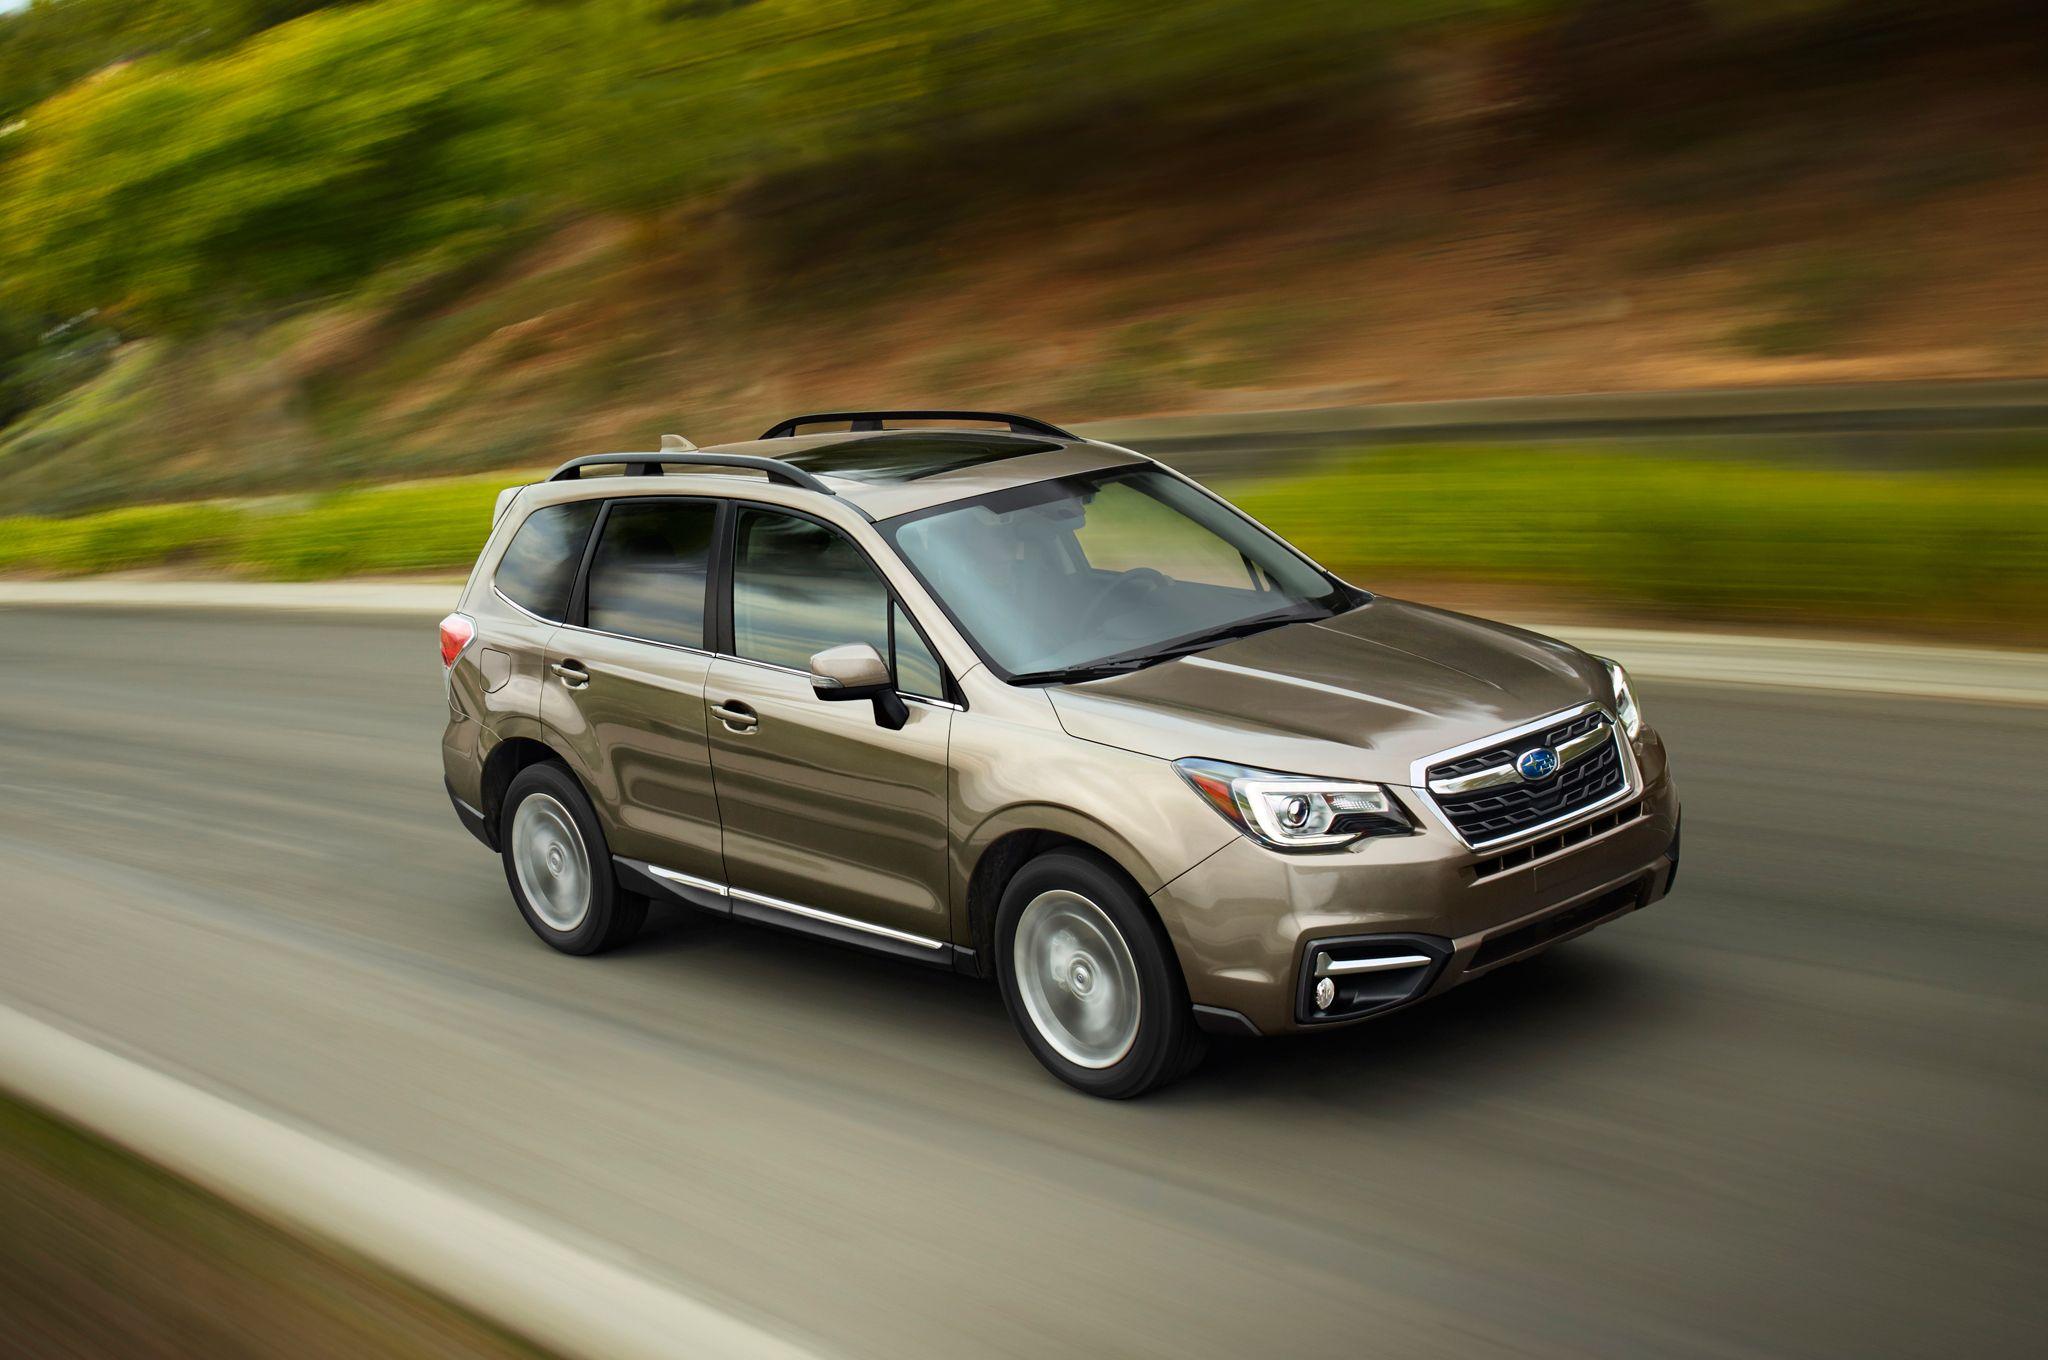 2017 Subaru Forester Priced From 23 470 Subaru Forester Subaru Crossover Suv